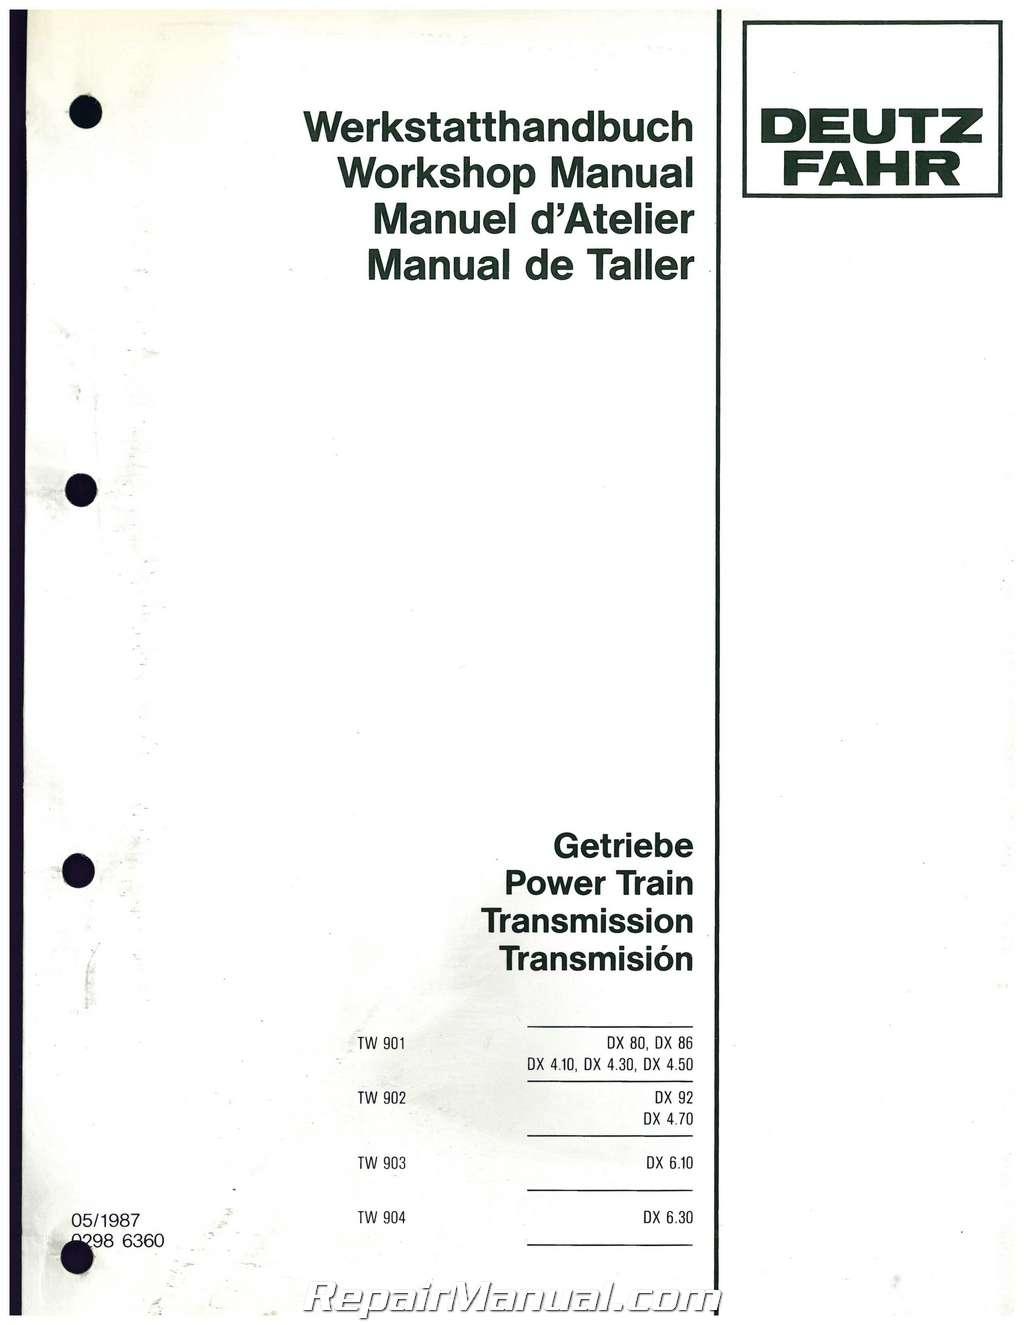 deutz allis model dx120 transmission service manual rh repairmanual com Deutz Diesel Engine Service Manuals Deutz Tractors